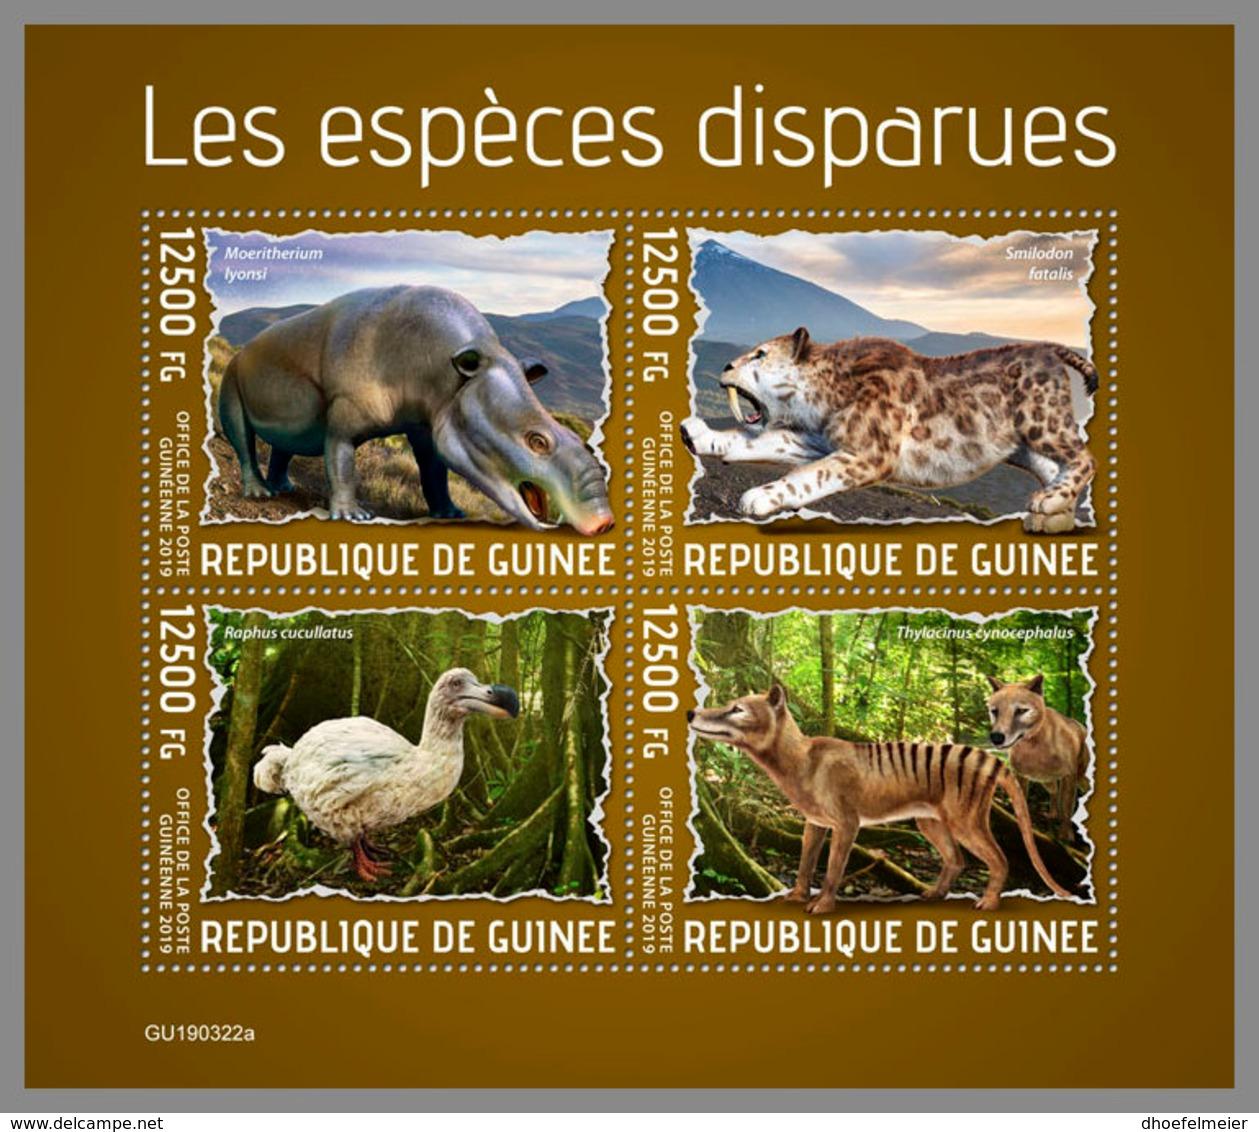 GUINEA REP. 2019 MNH Extinct Species Ausgestorbene Tiere Especes Disparues M/S - OFFICIAL ISSUE - DH1940 - Stamps